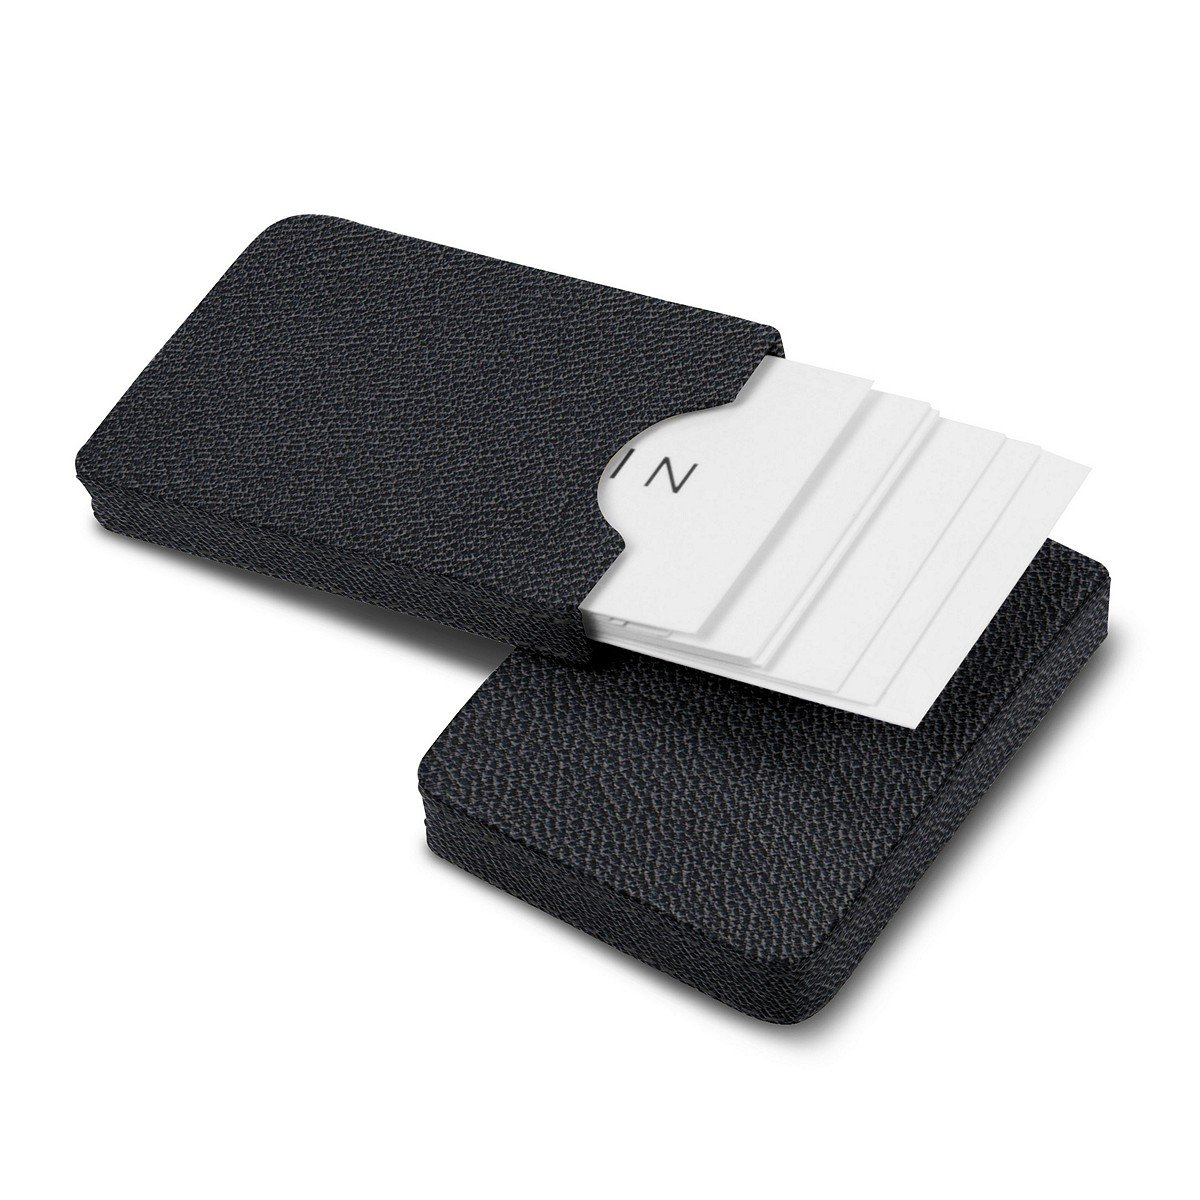 Lucrin - Sliding case for business cards - Black - Goat Leather